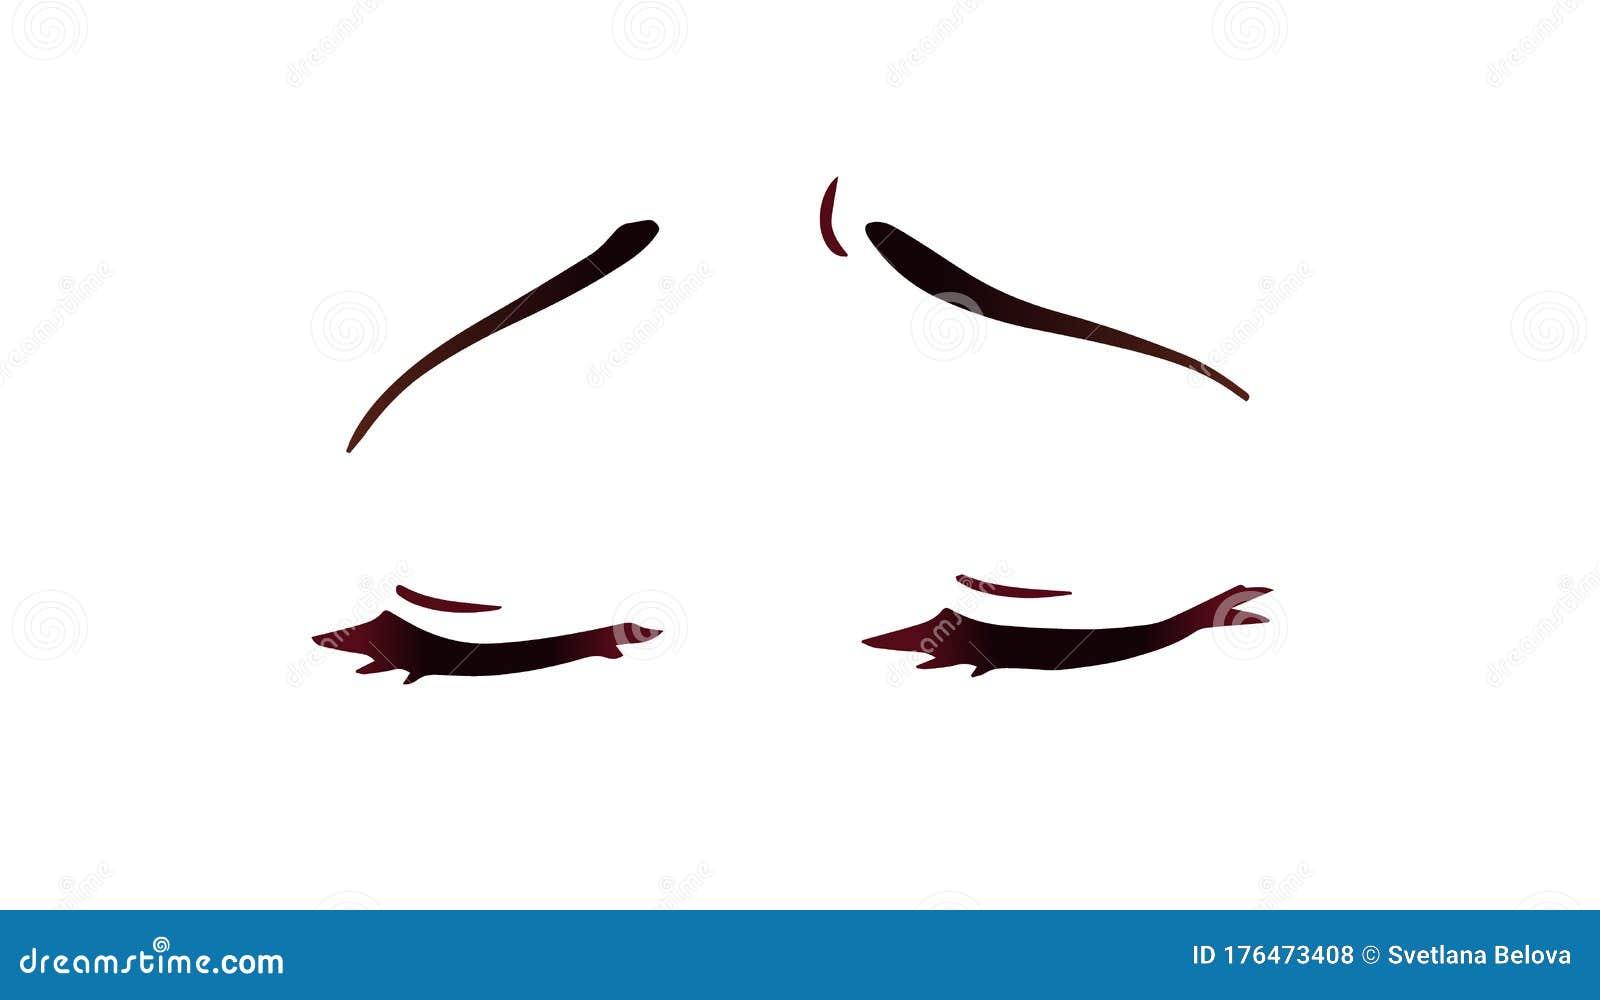 Sad Anime Face Manga Style Closed Eyes Hand Drawn Vector Cartoon Illustration Stock Vector Illustration Of Japanese Dramatic 176473408